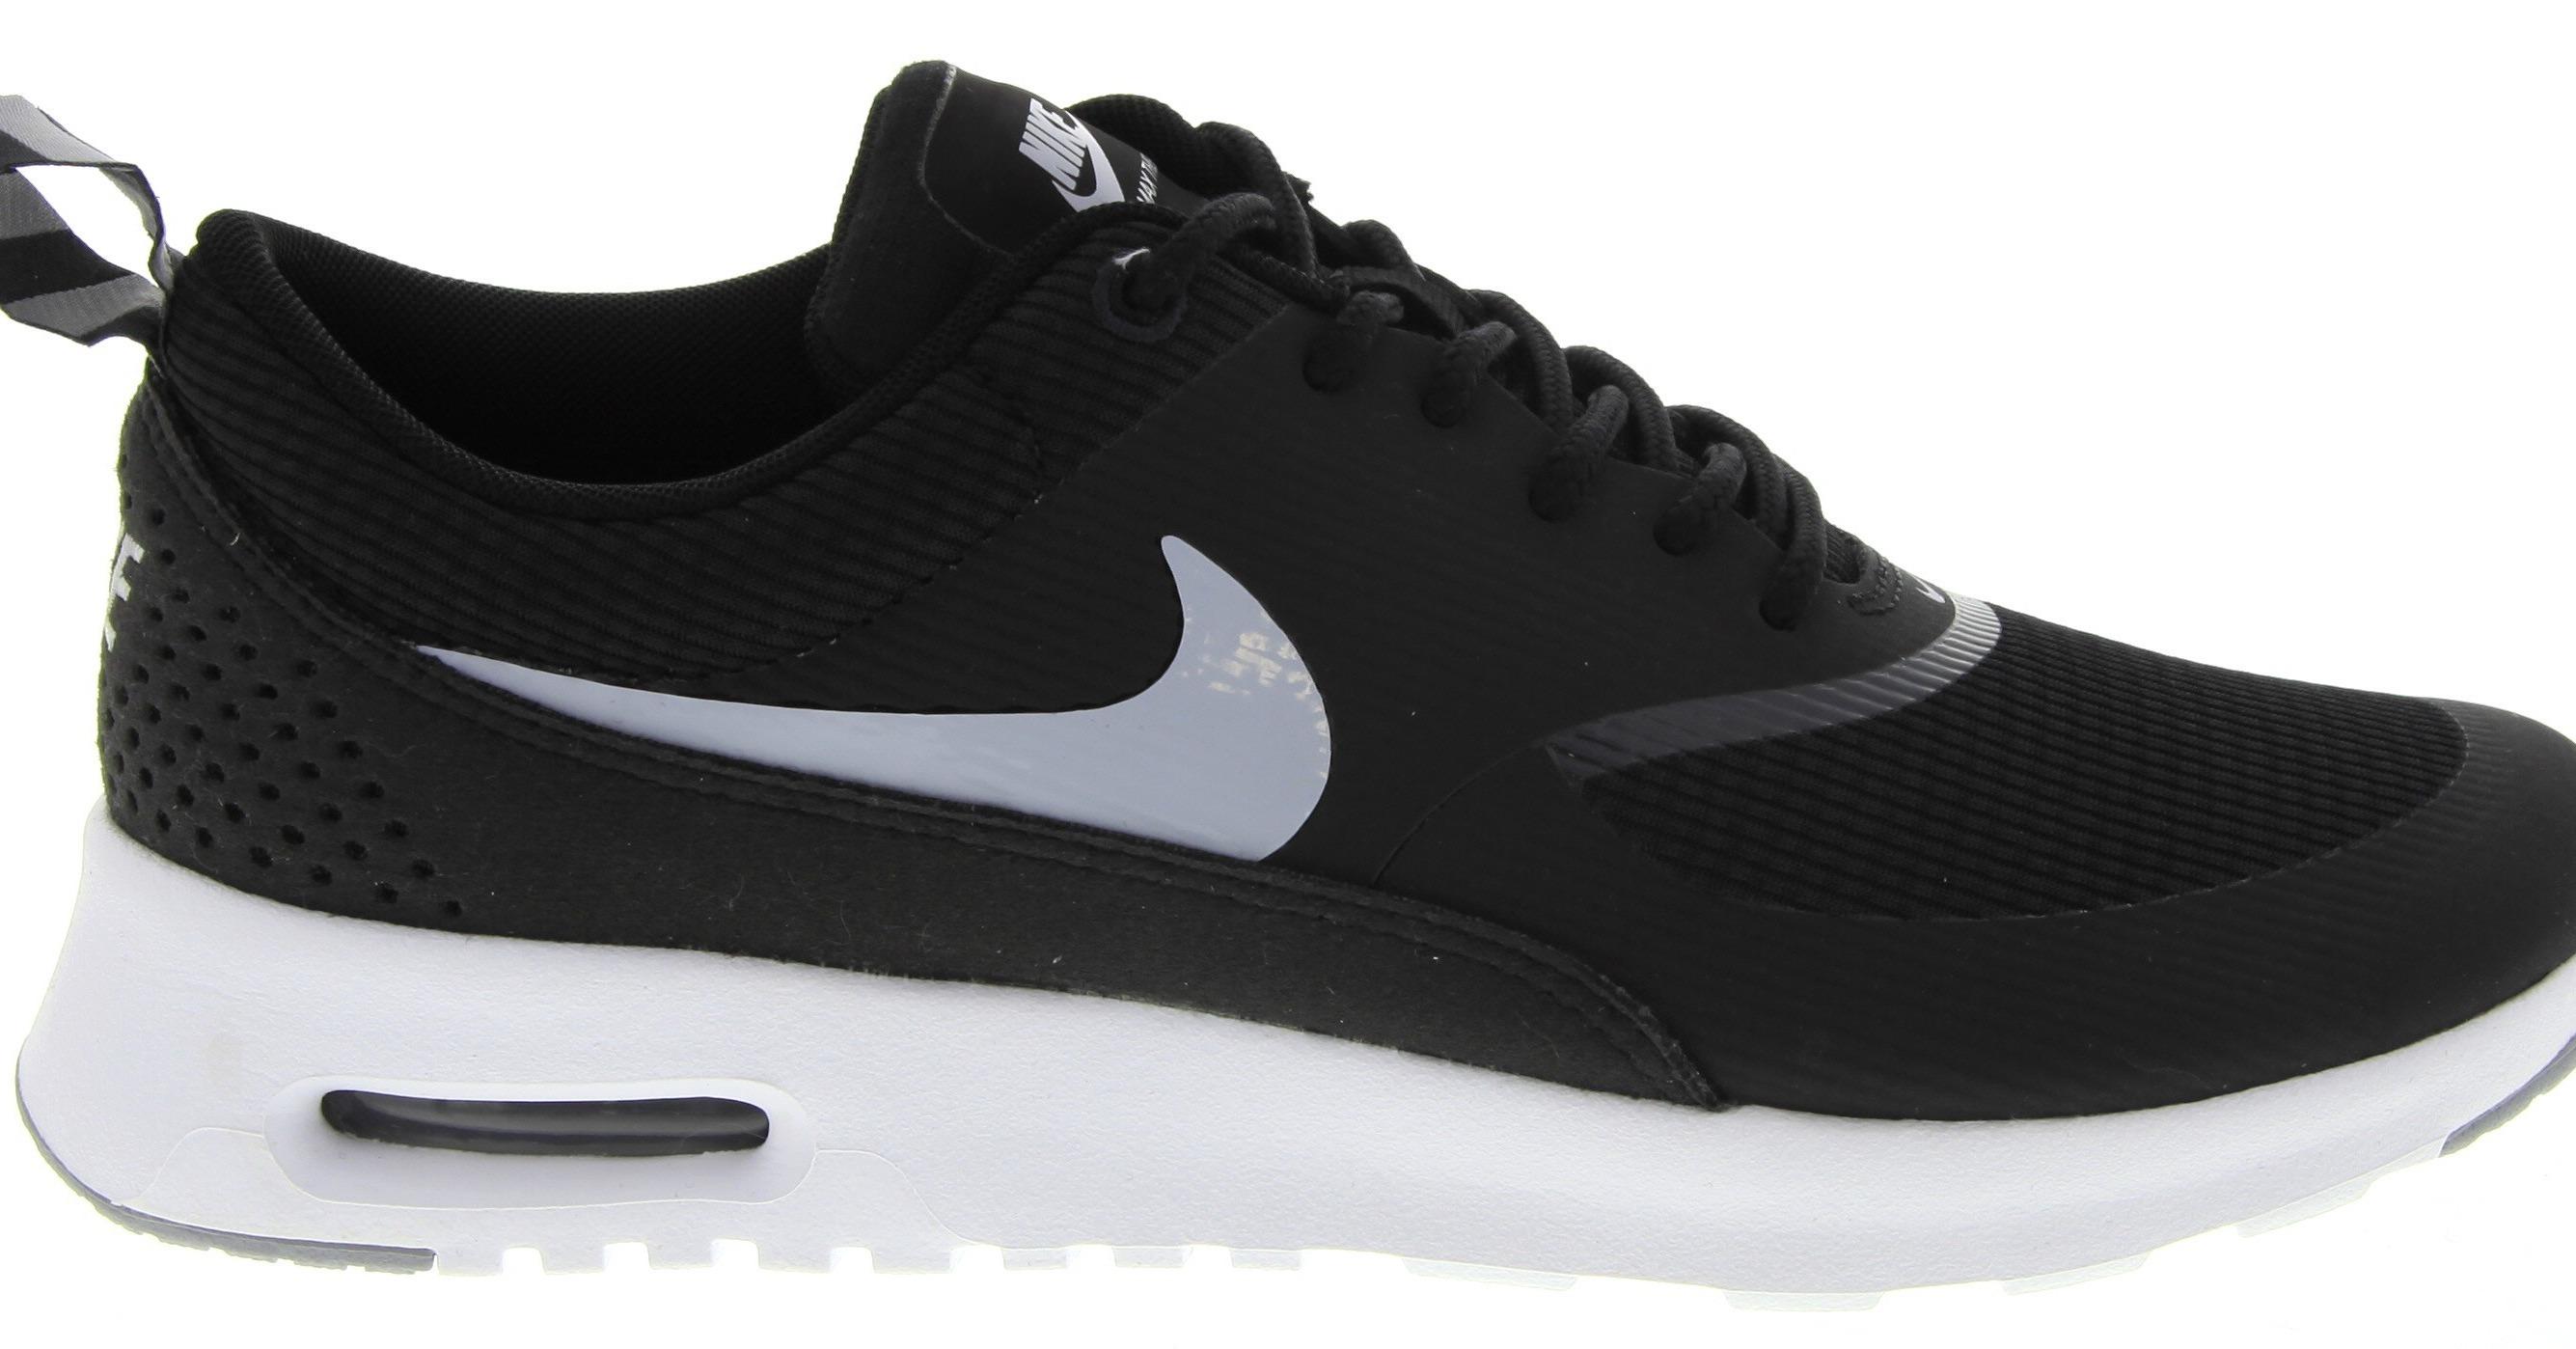 low cost 0b9a6 f59c1 Nike Air Max 1 Beast